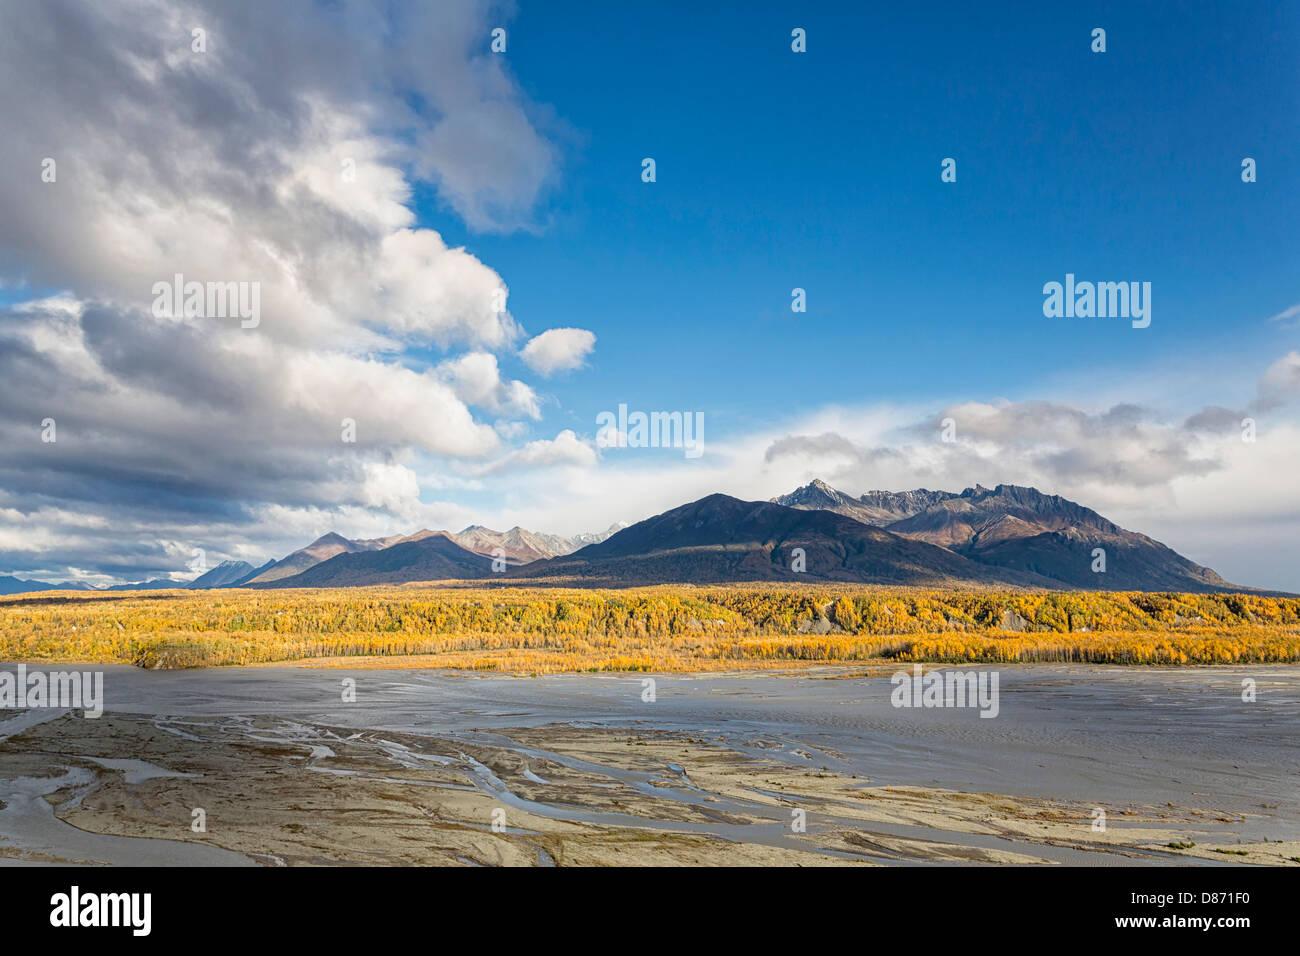 USA, Alaska, vue de la rivière Matanuska et Lazy Mountain Photo Stock